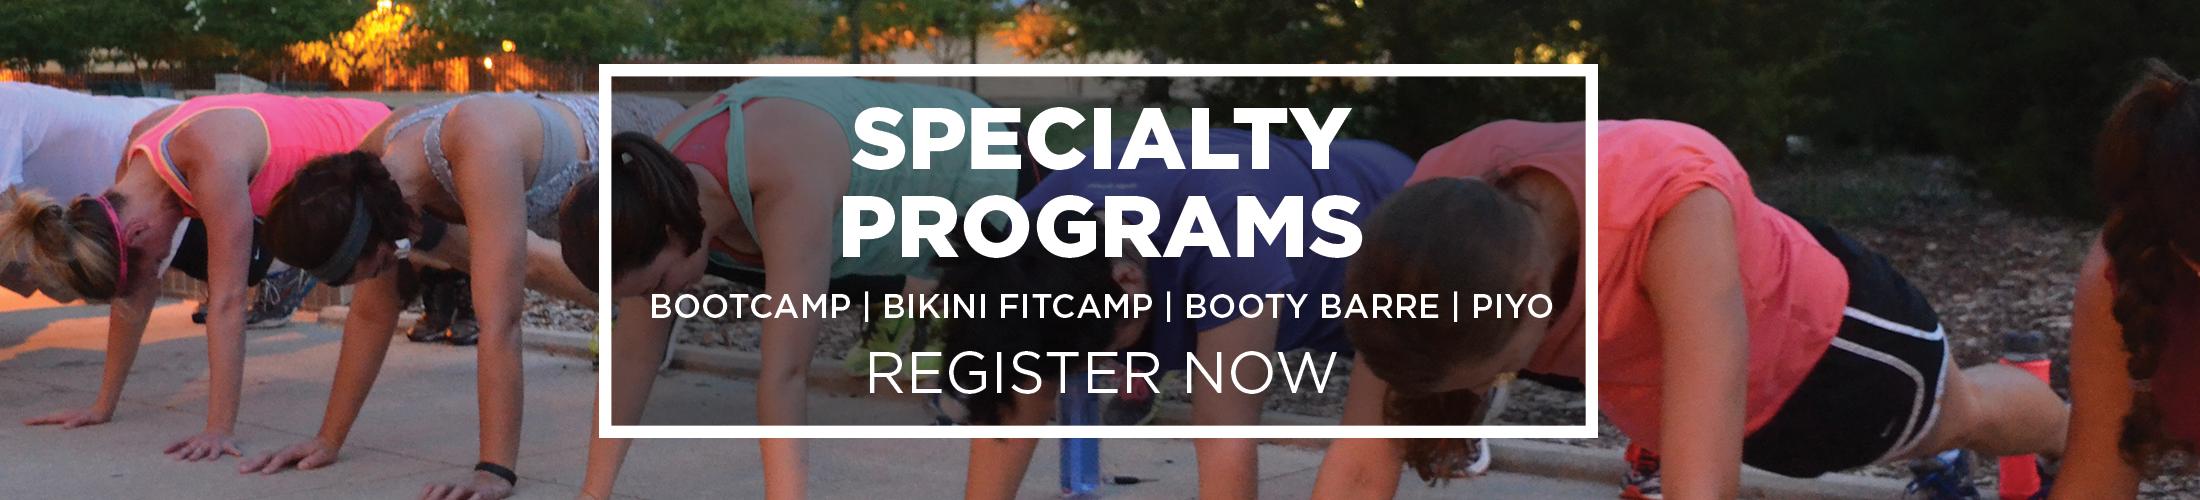 Texas A&M Rec Sports Specialty Programs Summer 2016